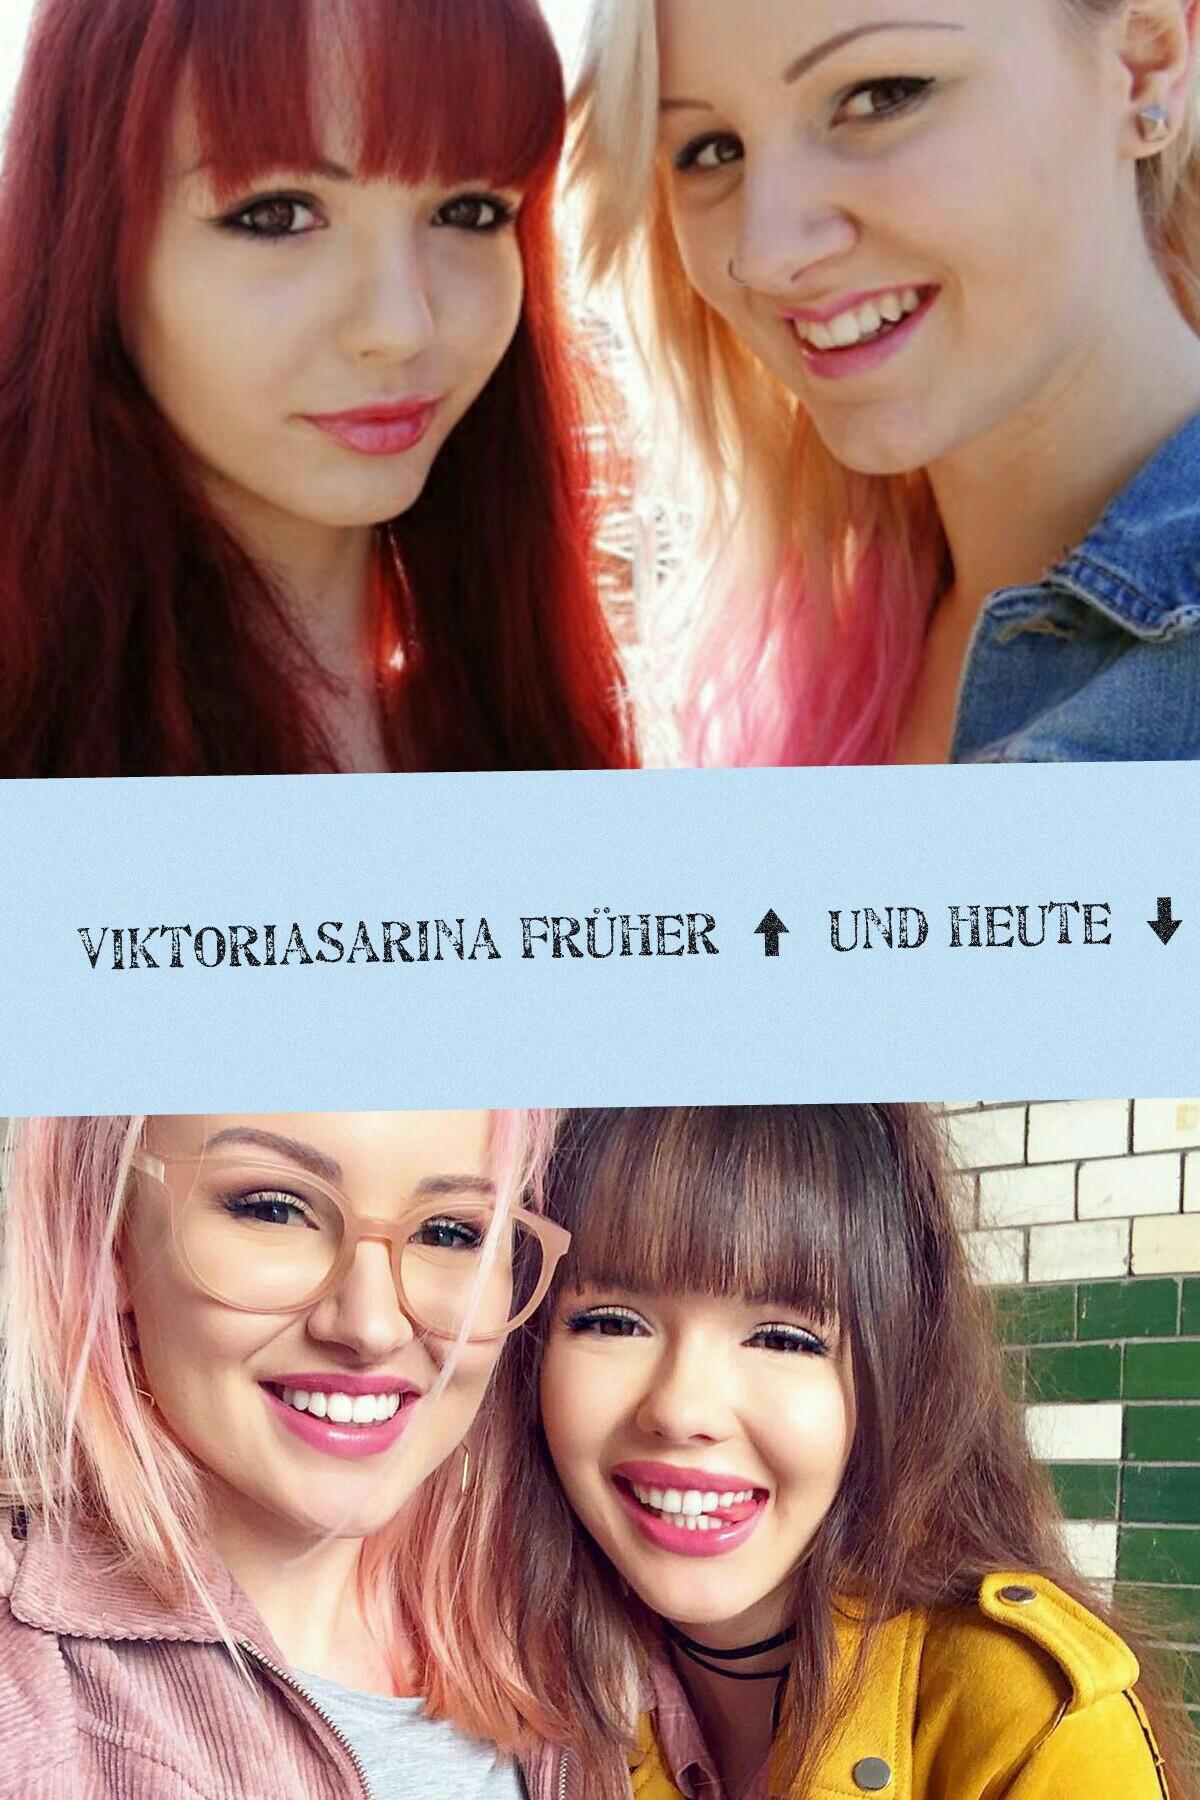 ViktoriaSarina früher und heue